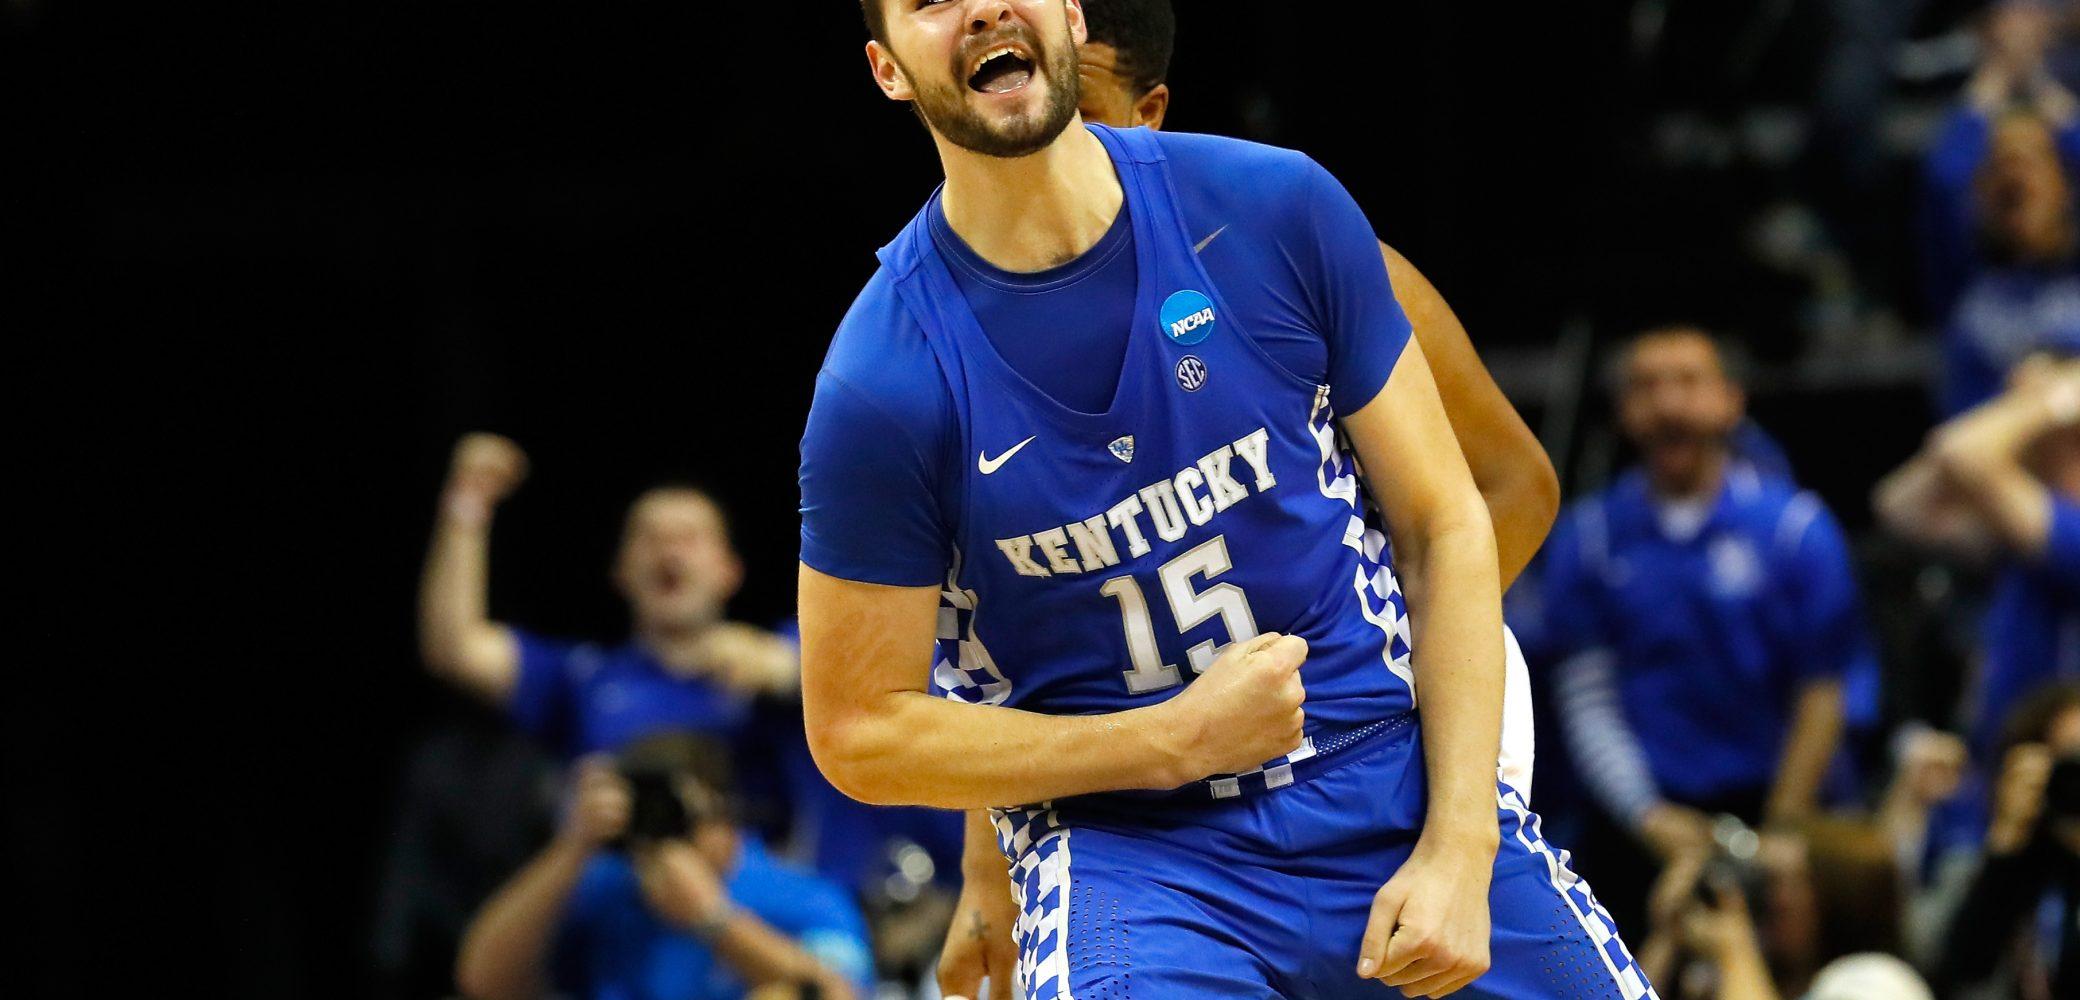 Isaac Humphries of the Kentucky Wildcats